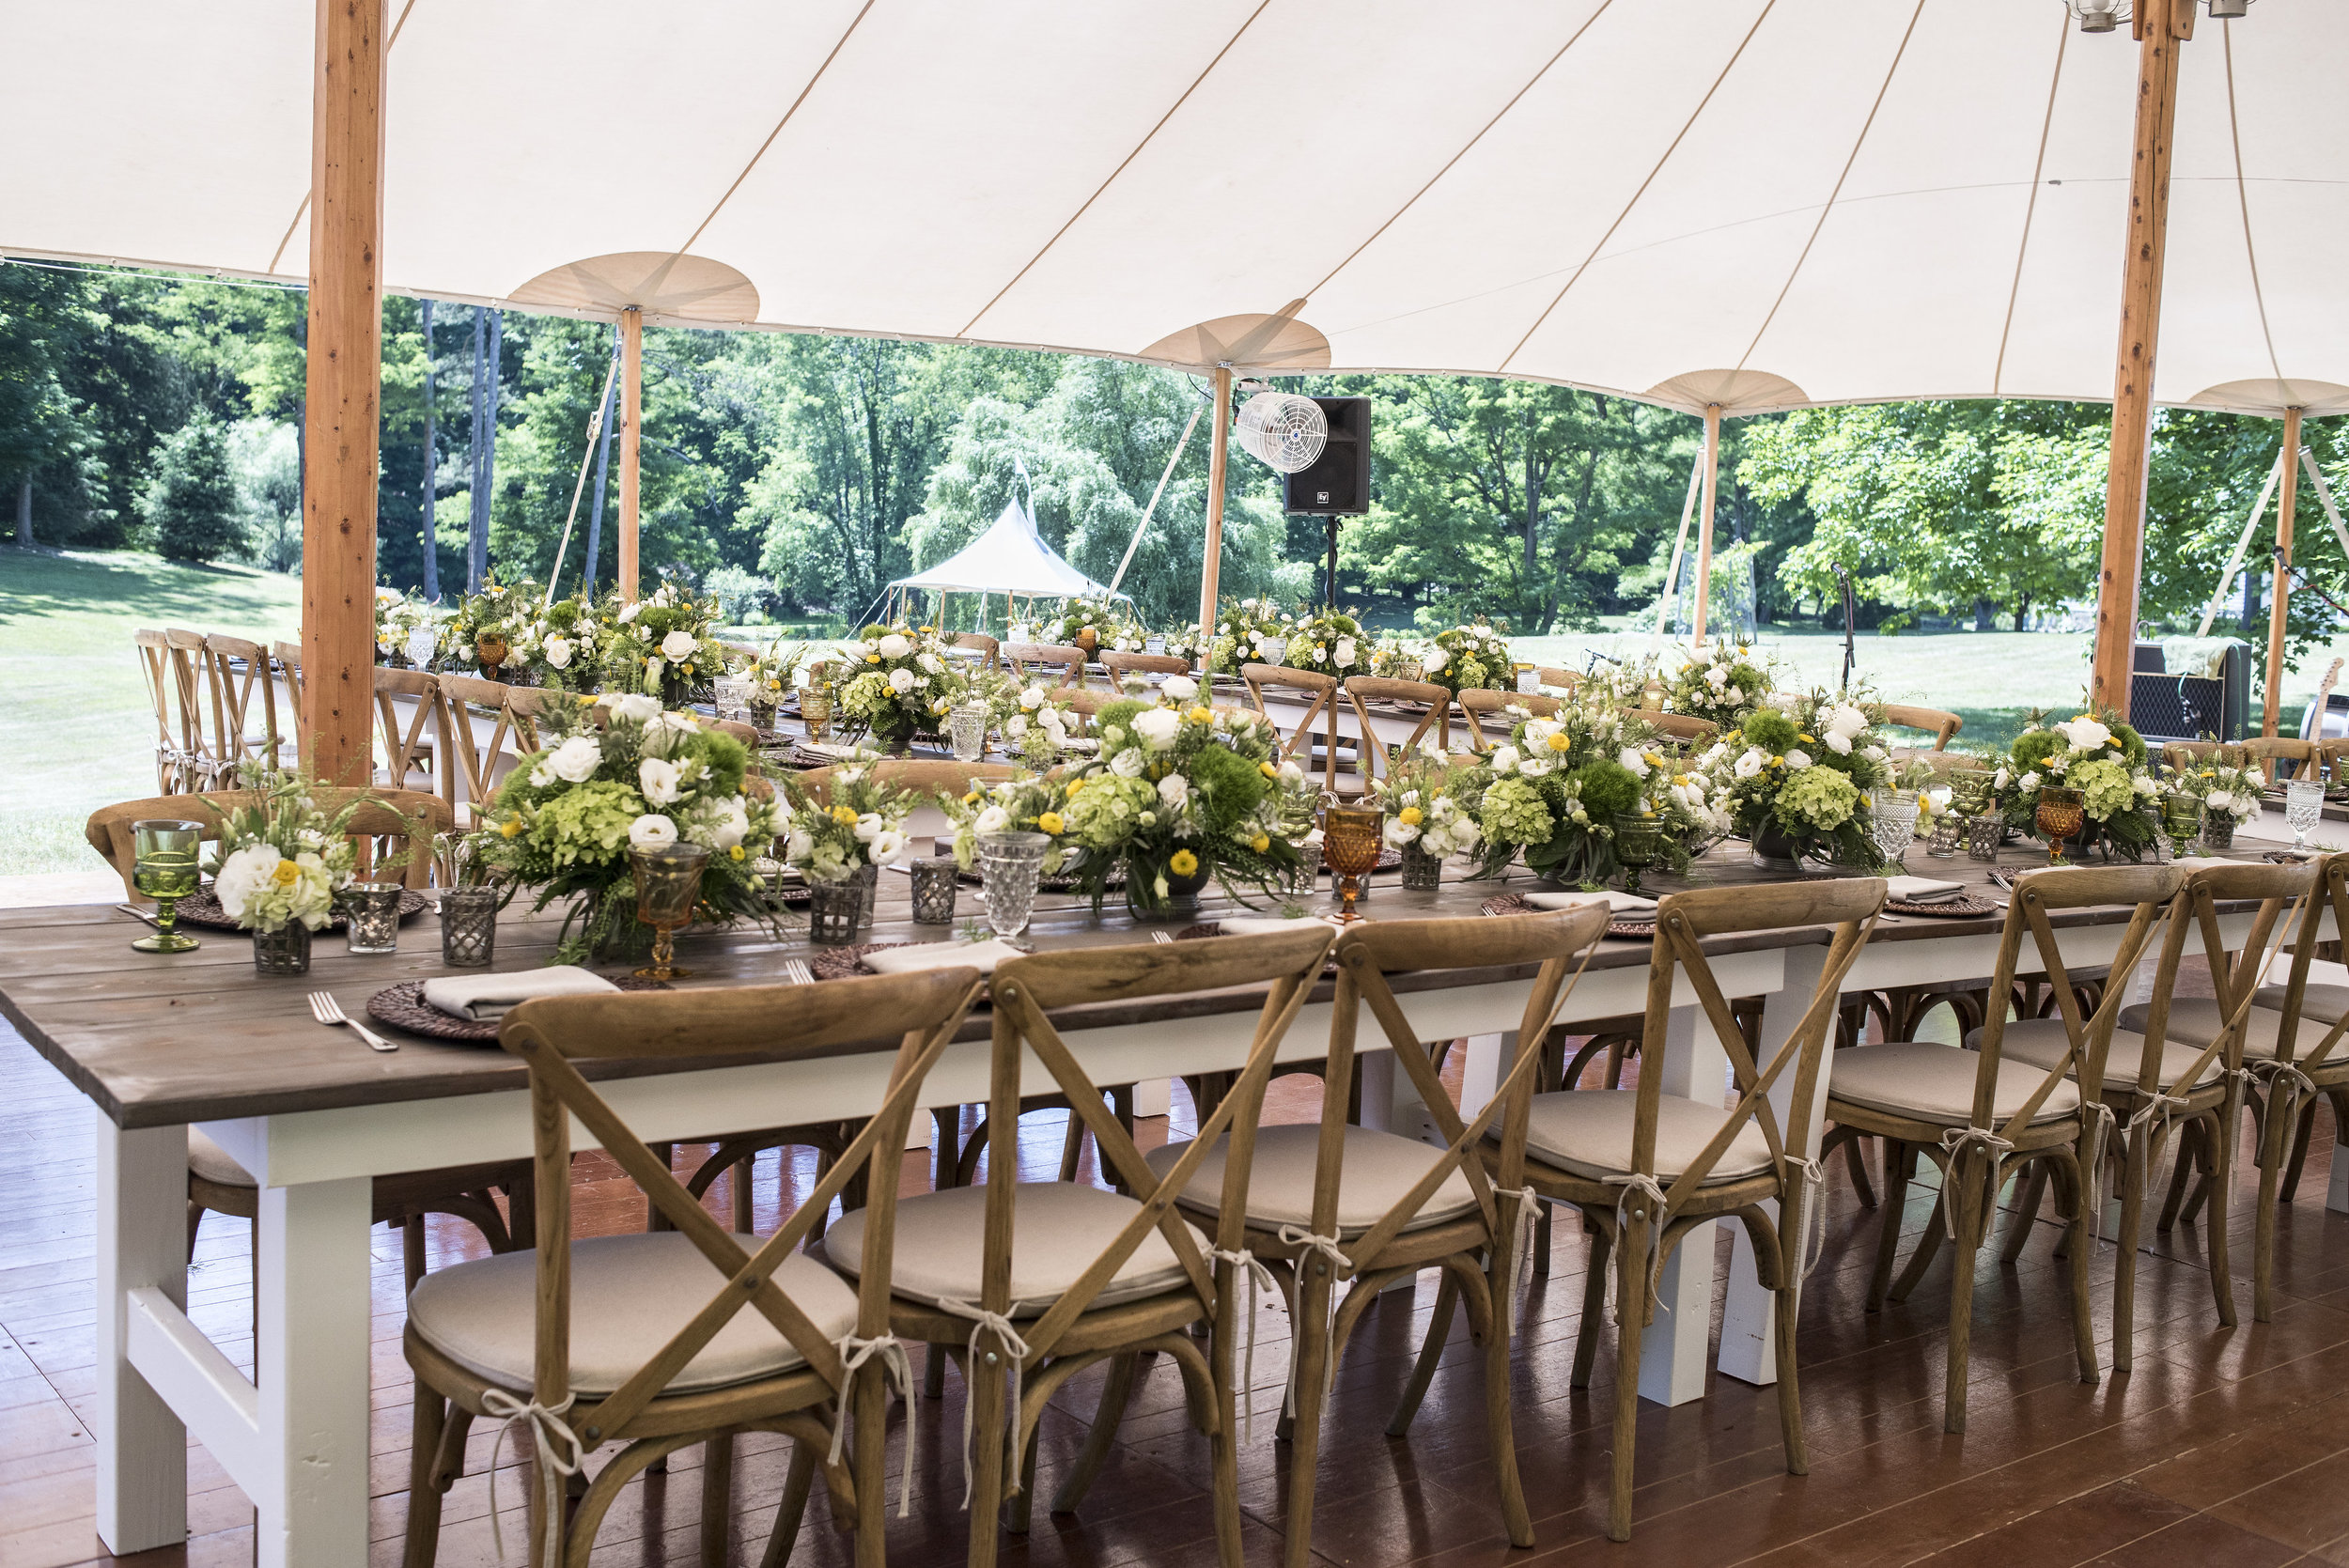 Andrea-Freeman-Events-Social-Event-Summer-Party-Rhinebeck-NY-10.JPG